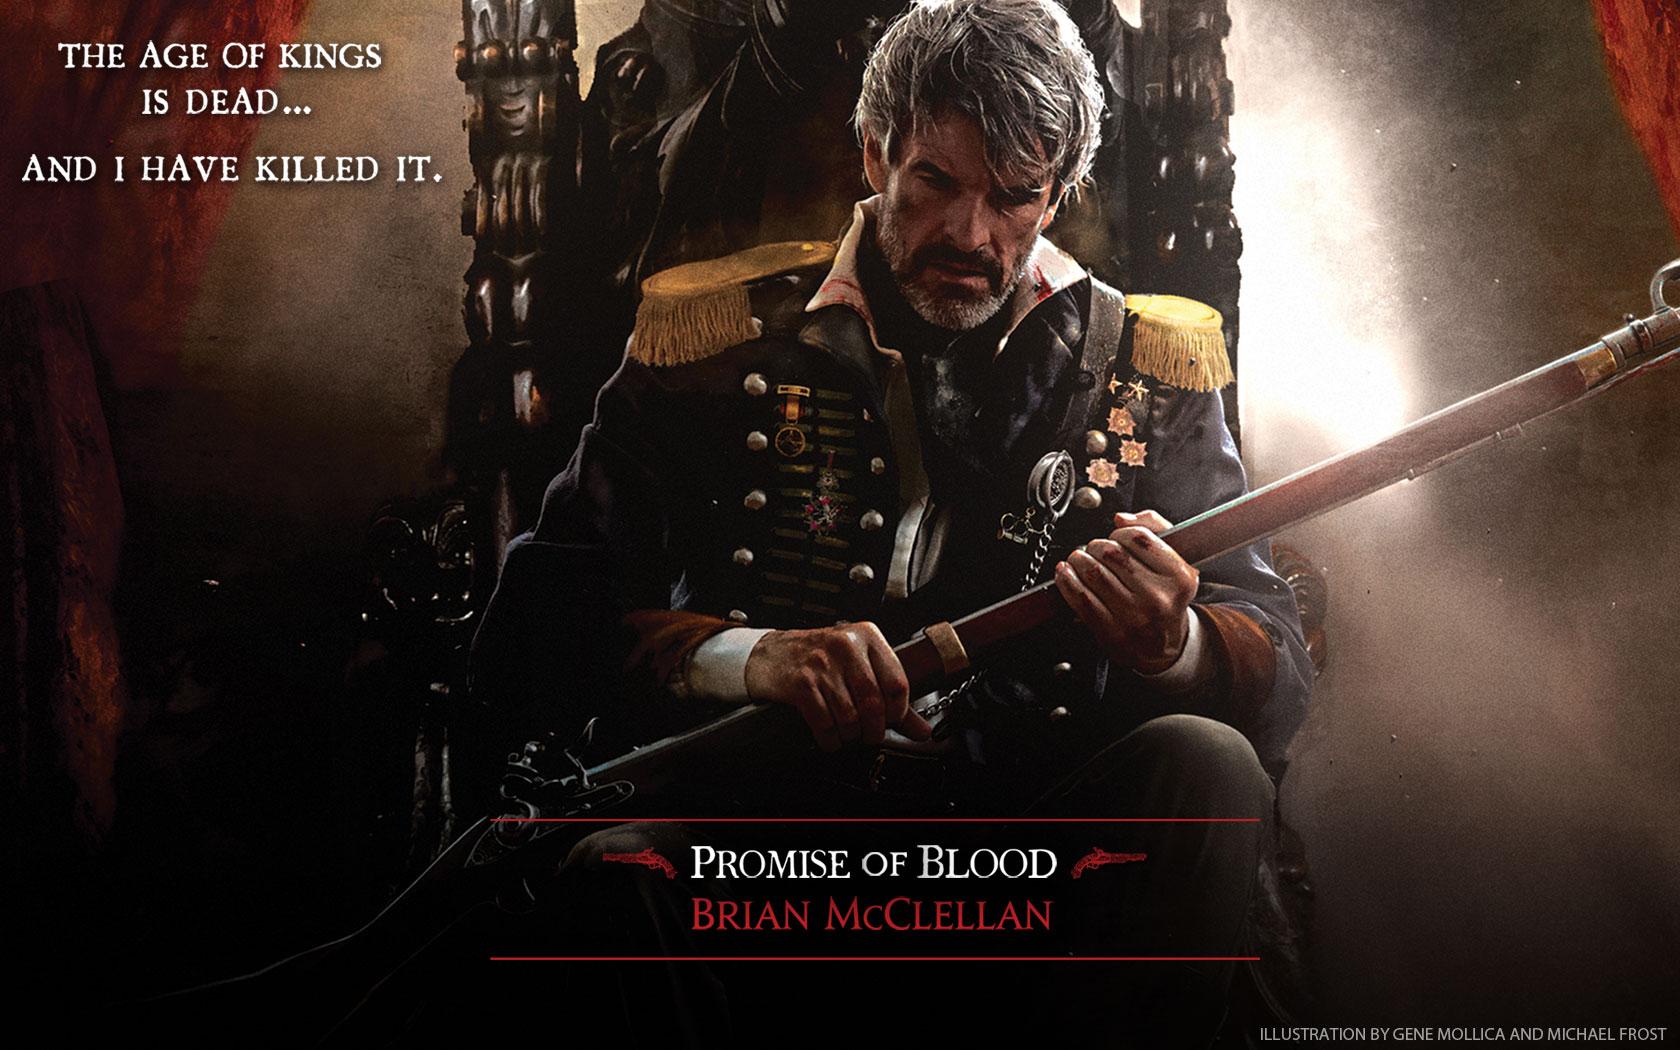 promise-of-blood-1680x1050.jpg